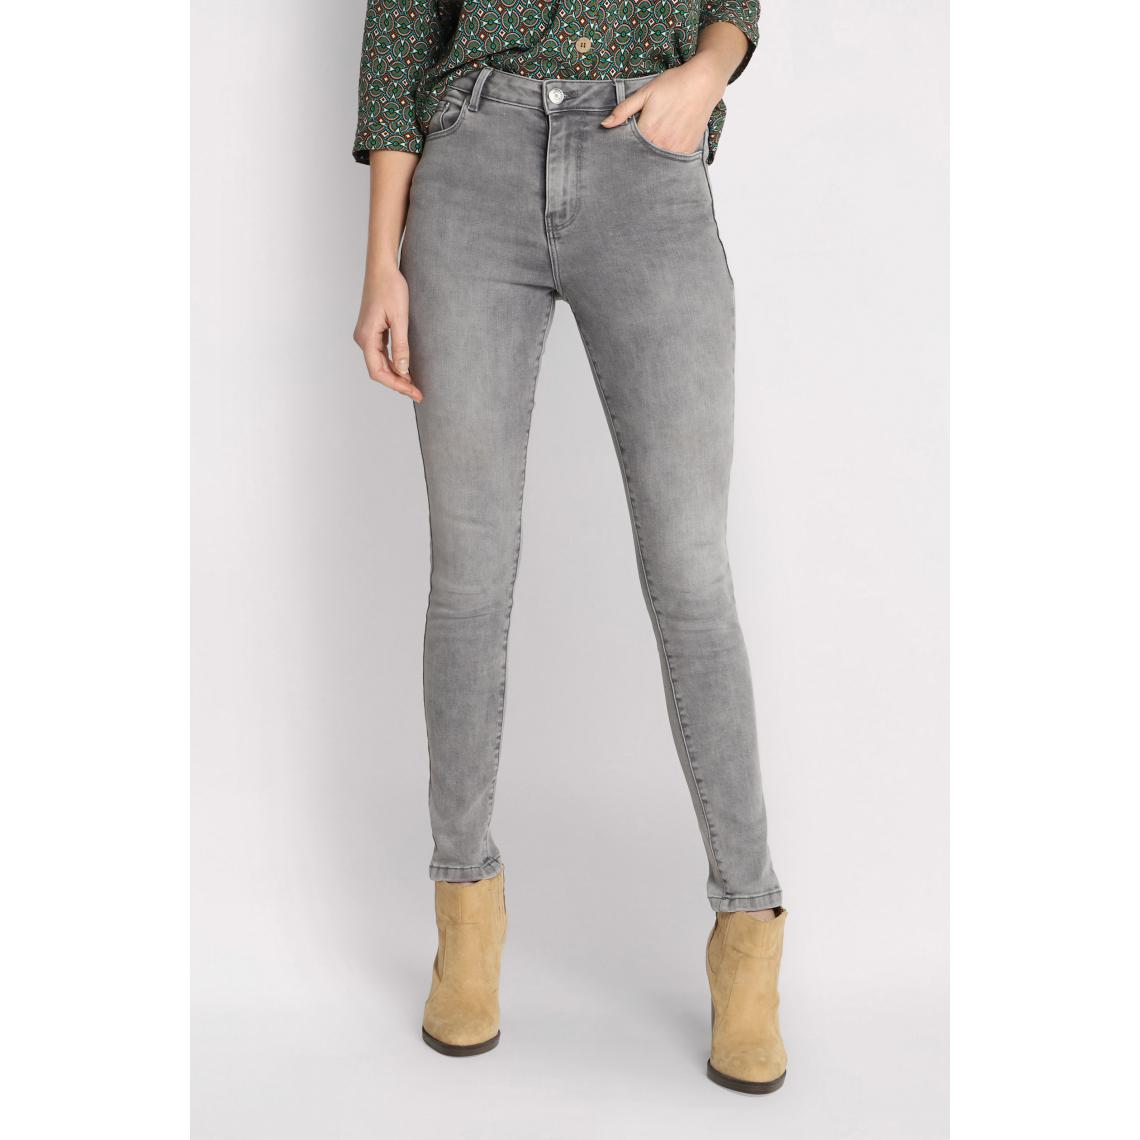 Jeans skinny 5 poches - Cache cache - Modalova